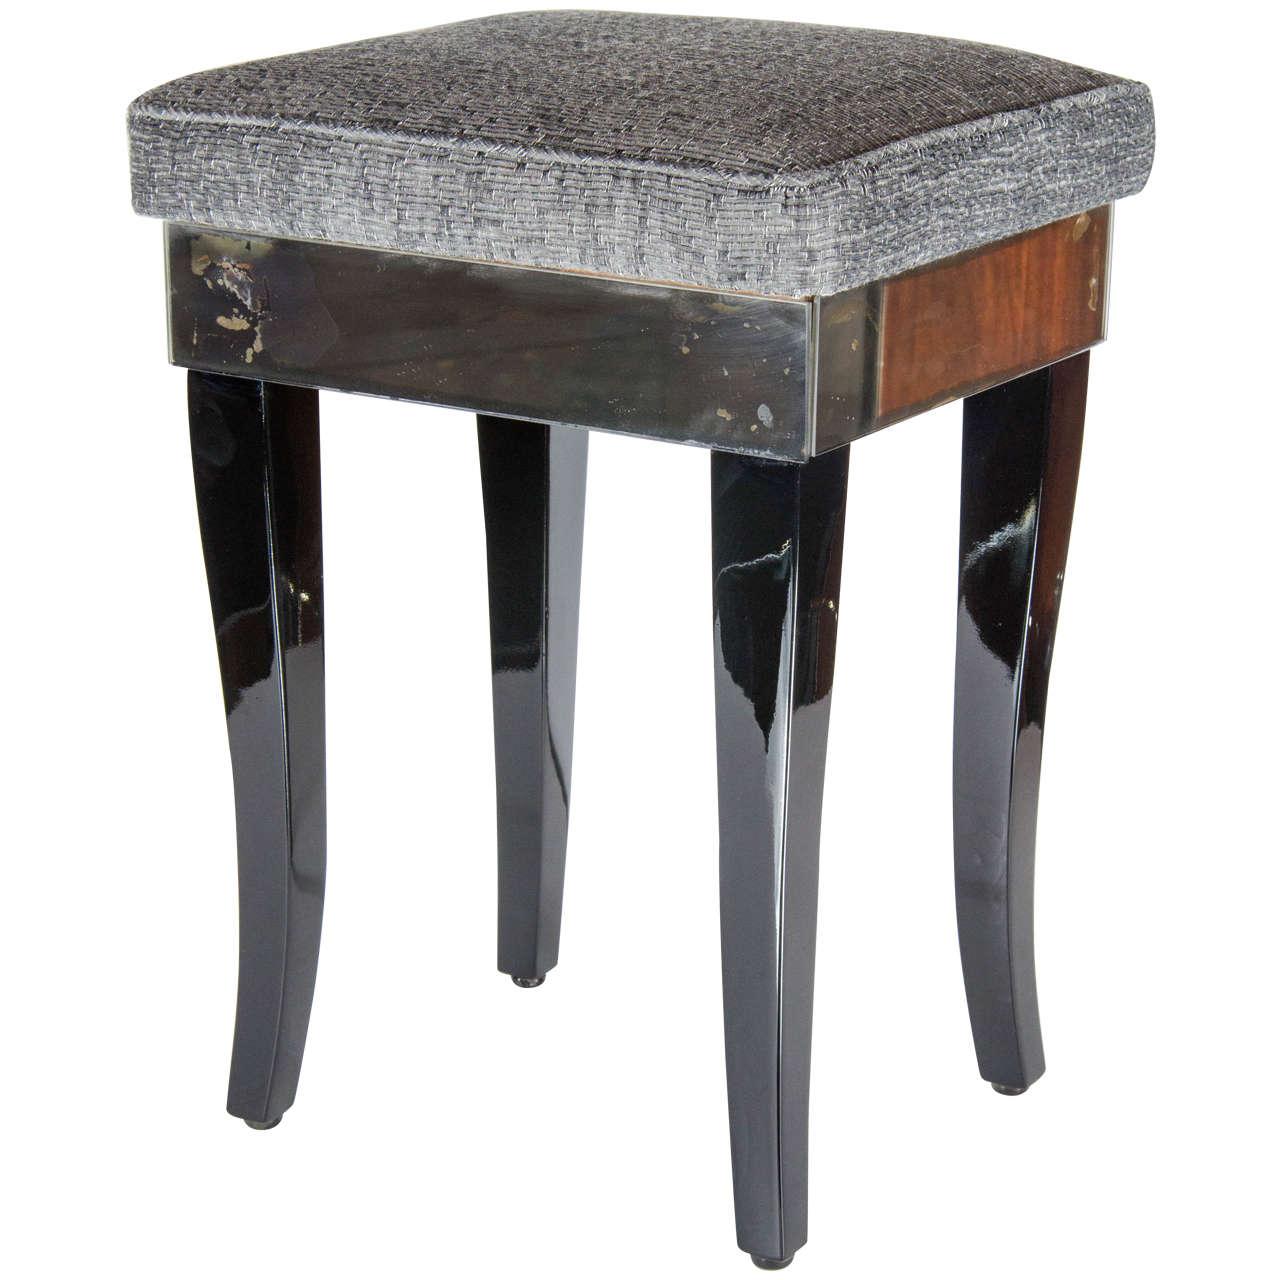 Elegant 1940s hollywood smoked mirror vanity stool at 1stdibs - Elegant vanity stools ...